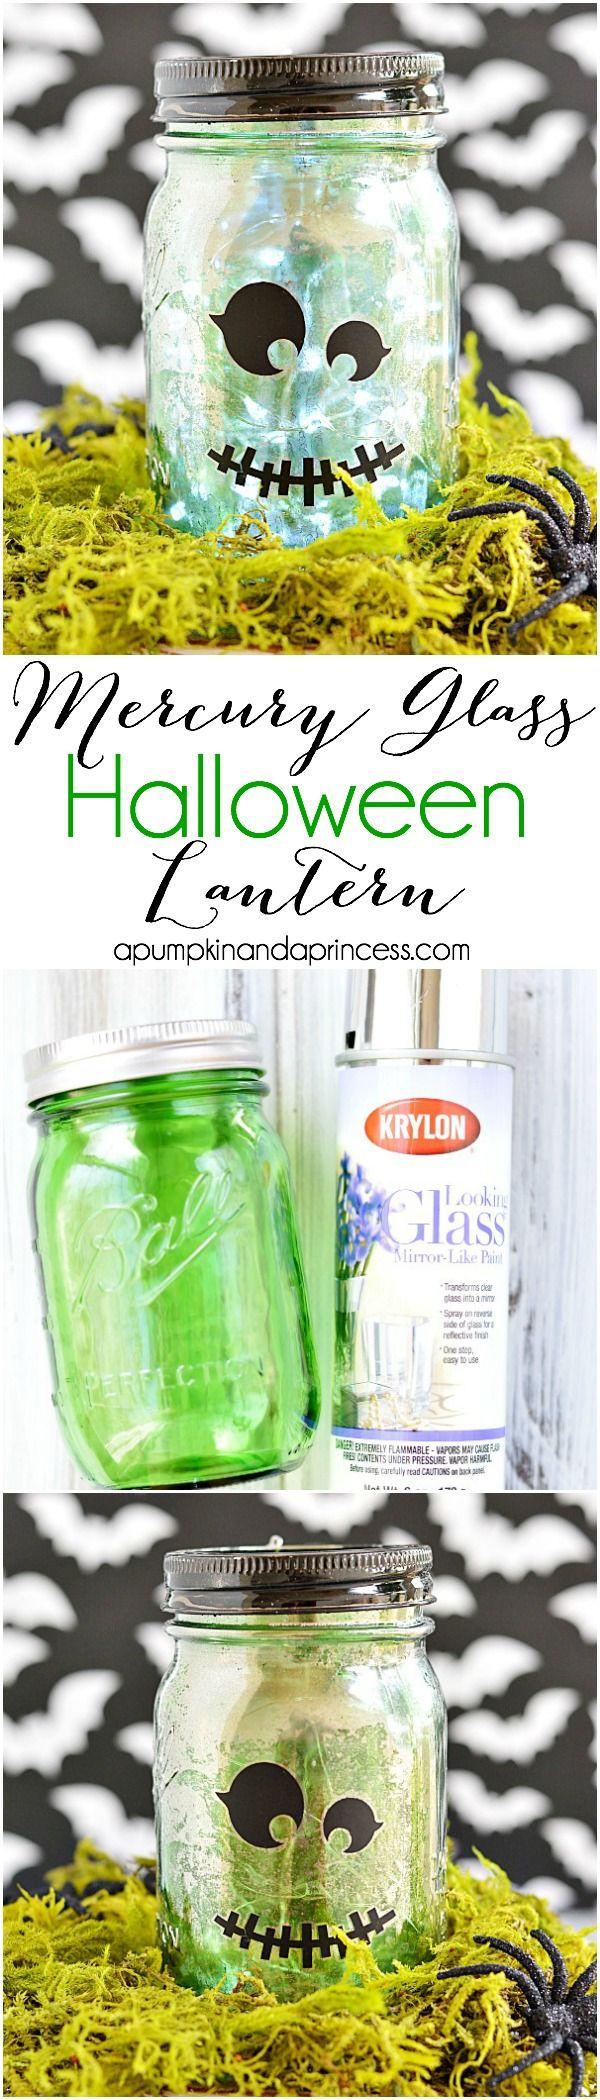 Mercury Glass Halloween Lantern